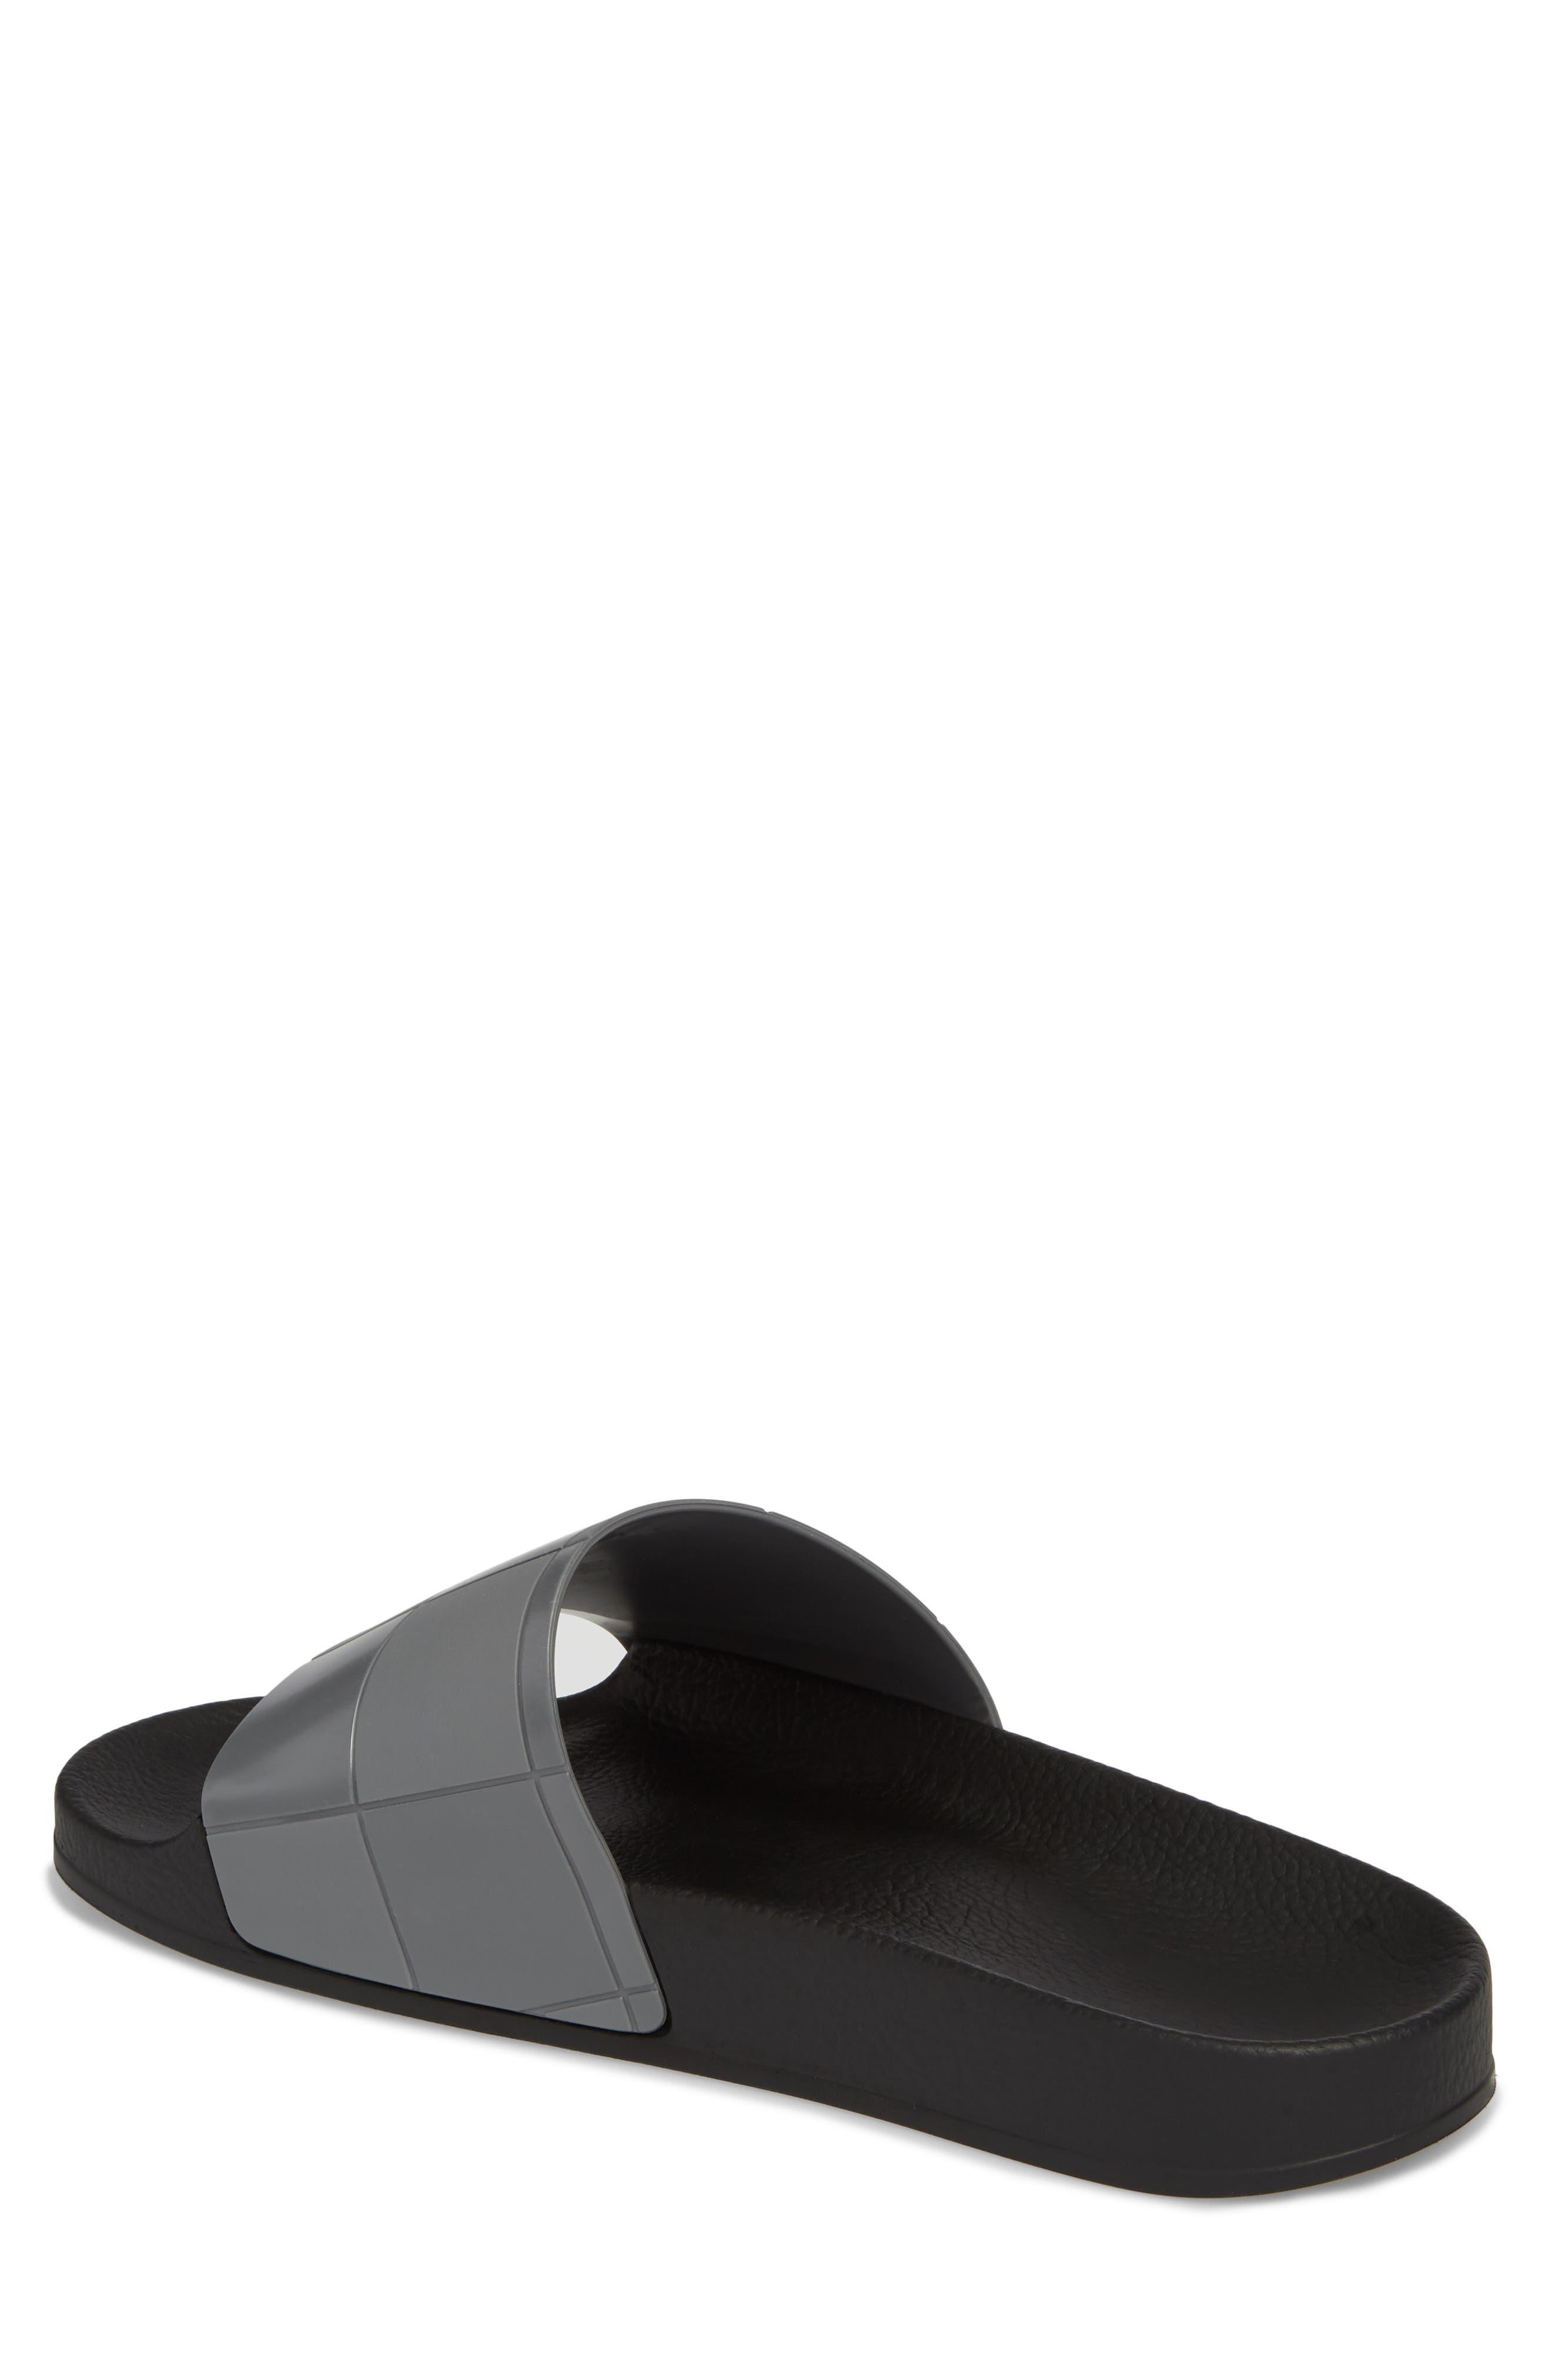 Adilette Checkerboard Sport Slide,                             Alternate thumbnail 2, color,                             Core Black/ Granite